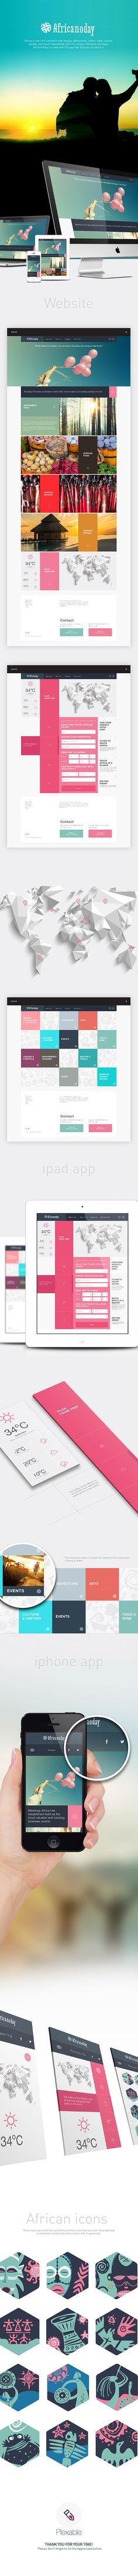 Africanoday | Responsive web app by Plexable Inc, via Behance